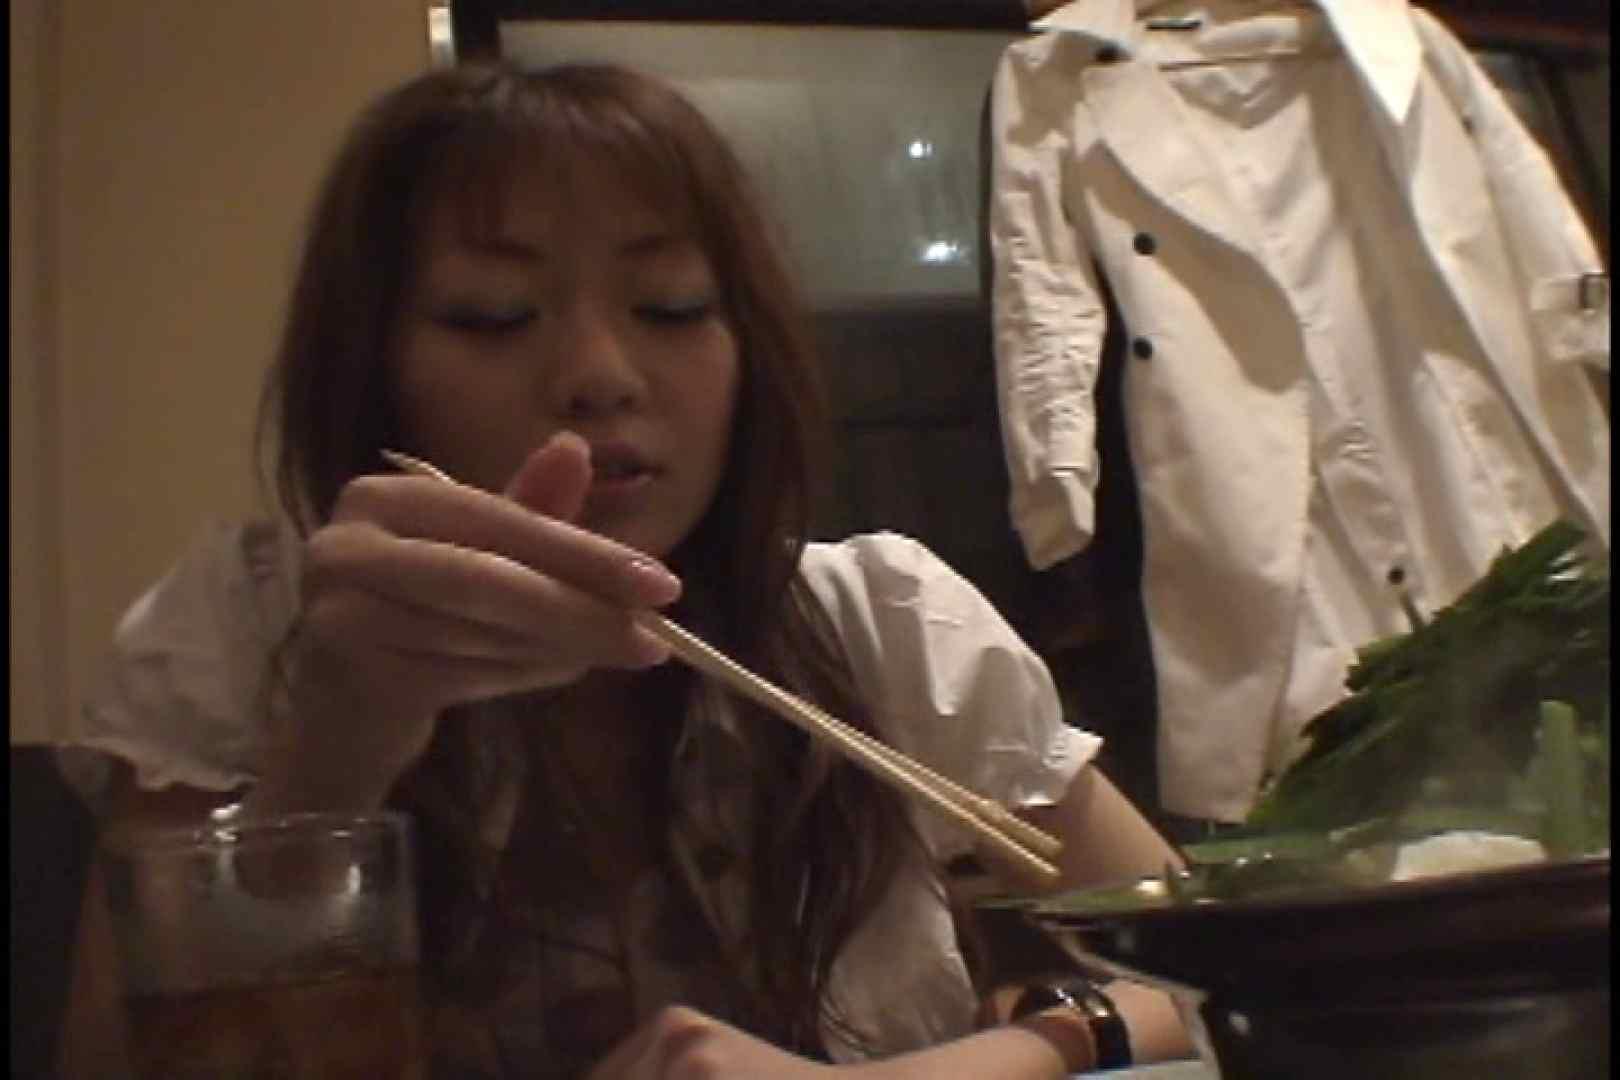 JDハンター全国ツアー vol.001 後編 女子大生のエロ動画  81PIX 2